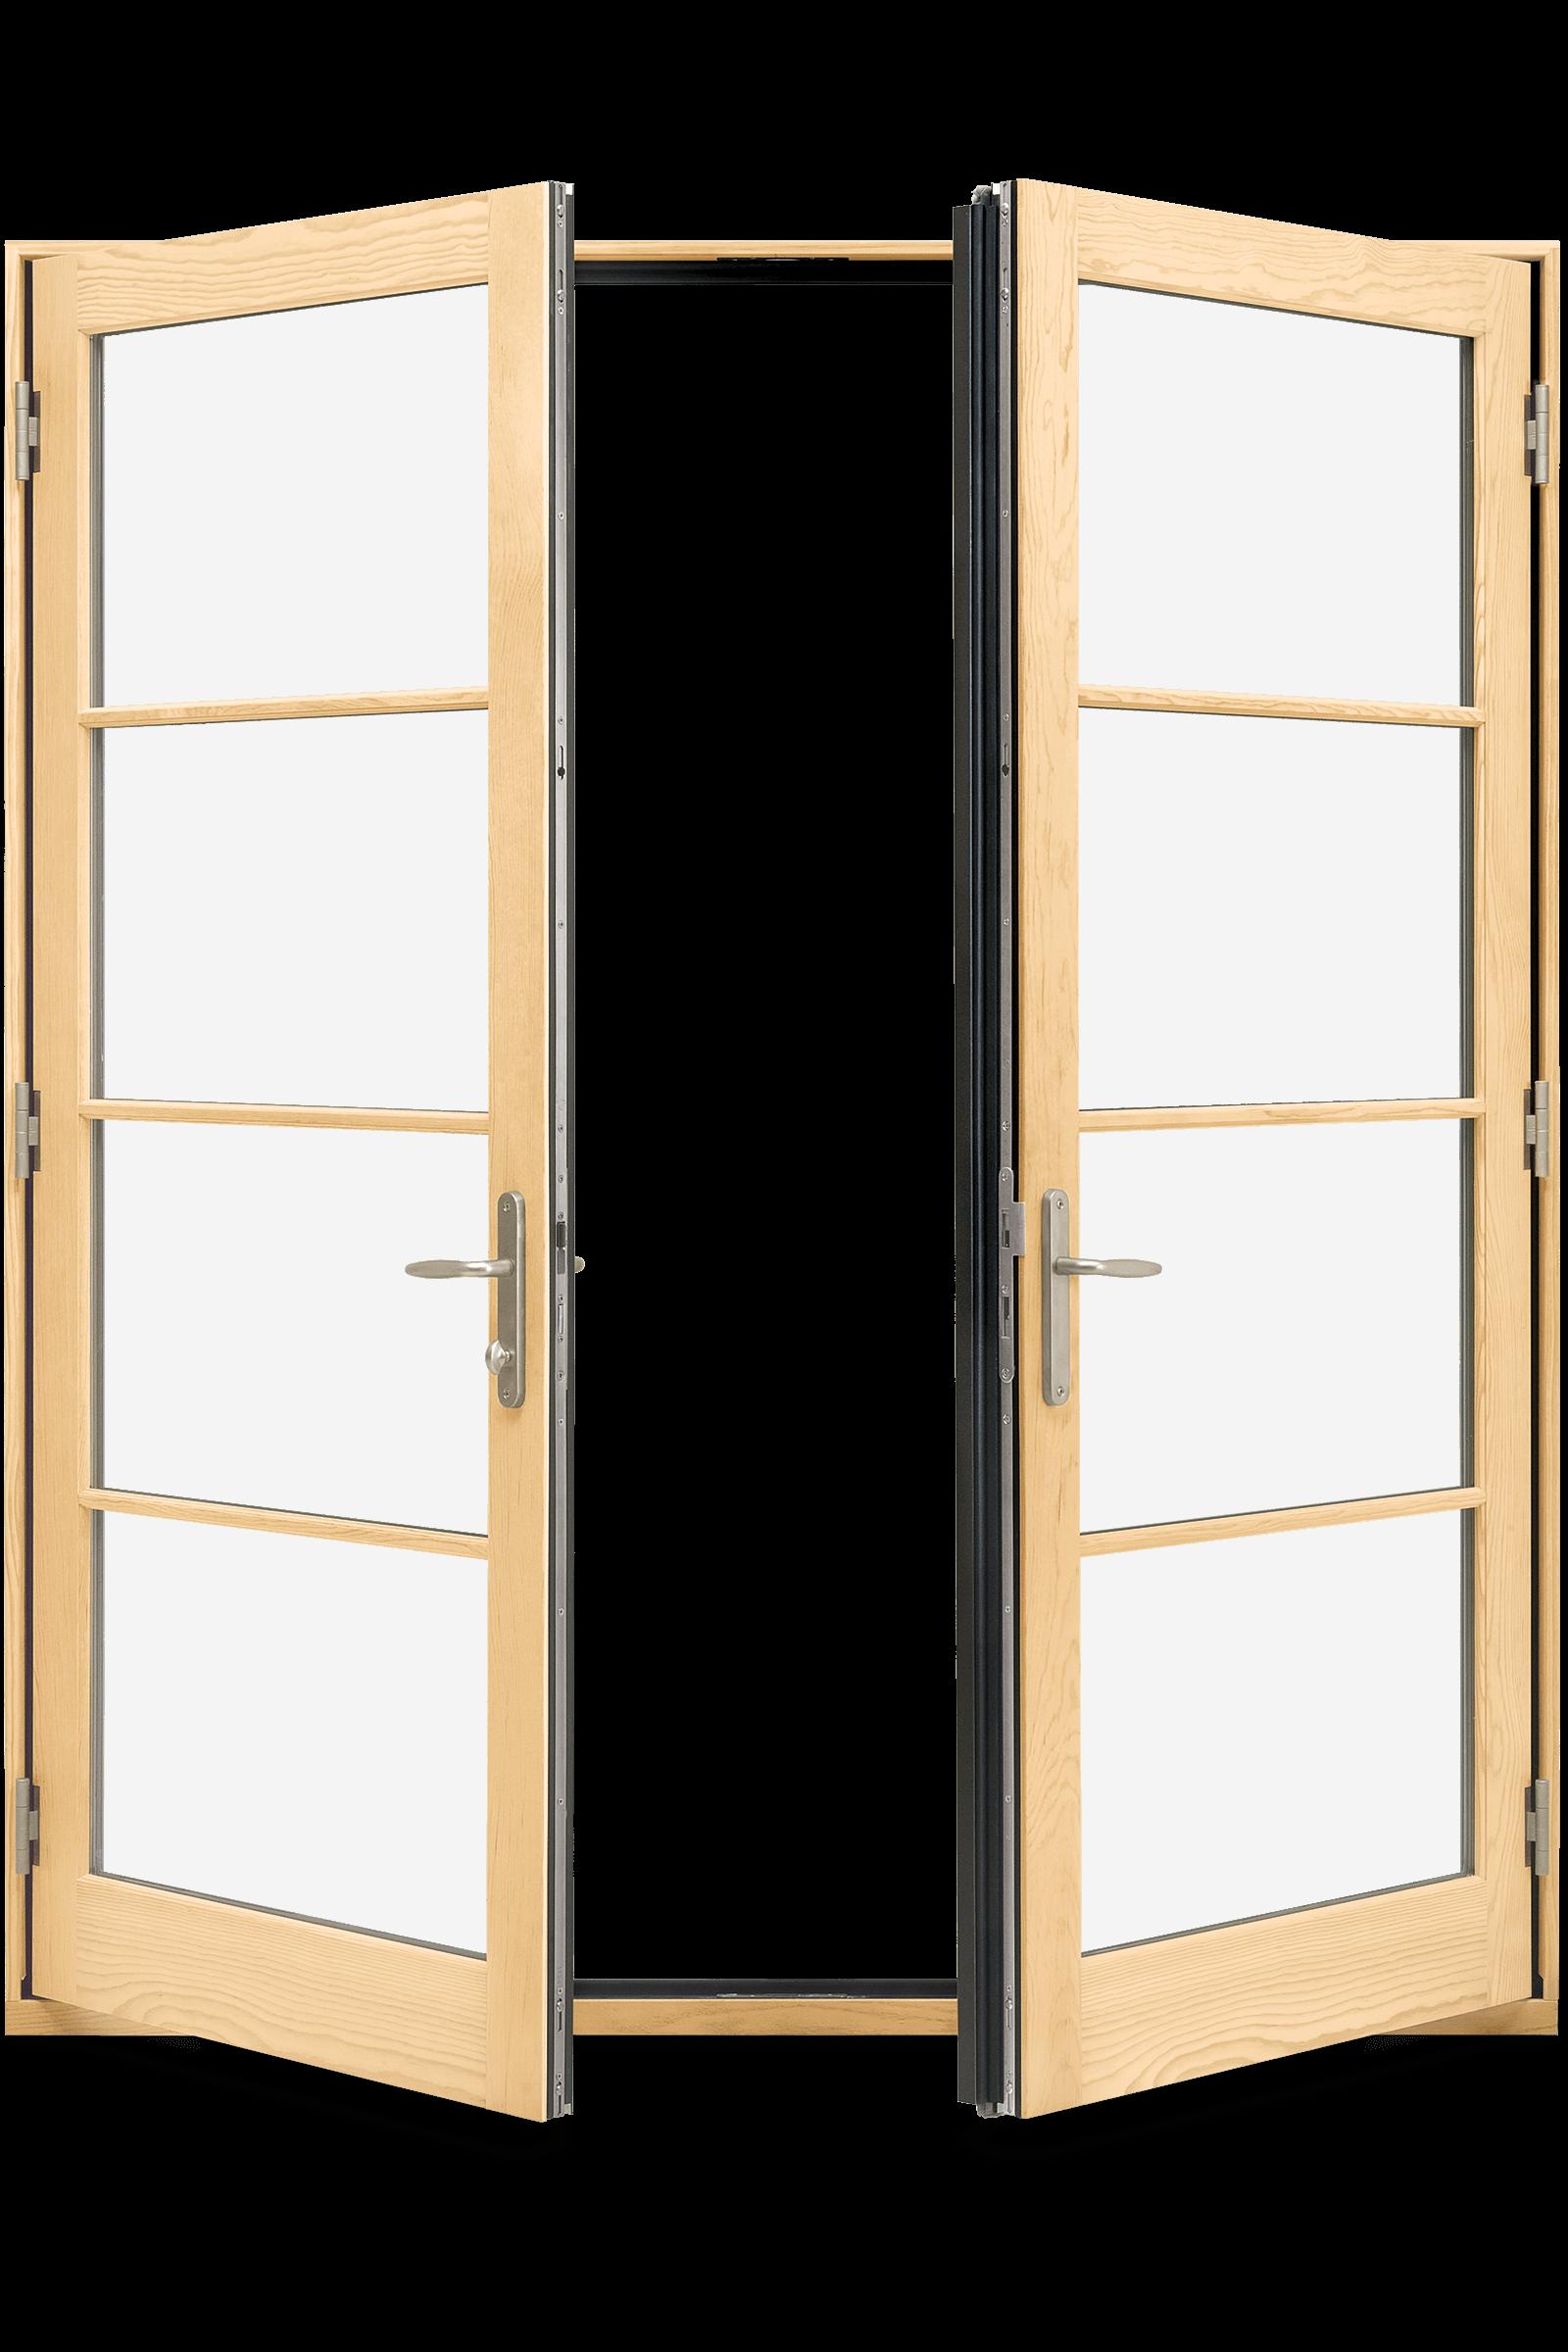 Wood Fibergl Inswing Outswing French Doors Elevate Swinging